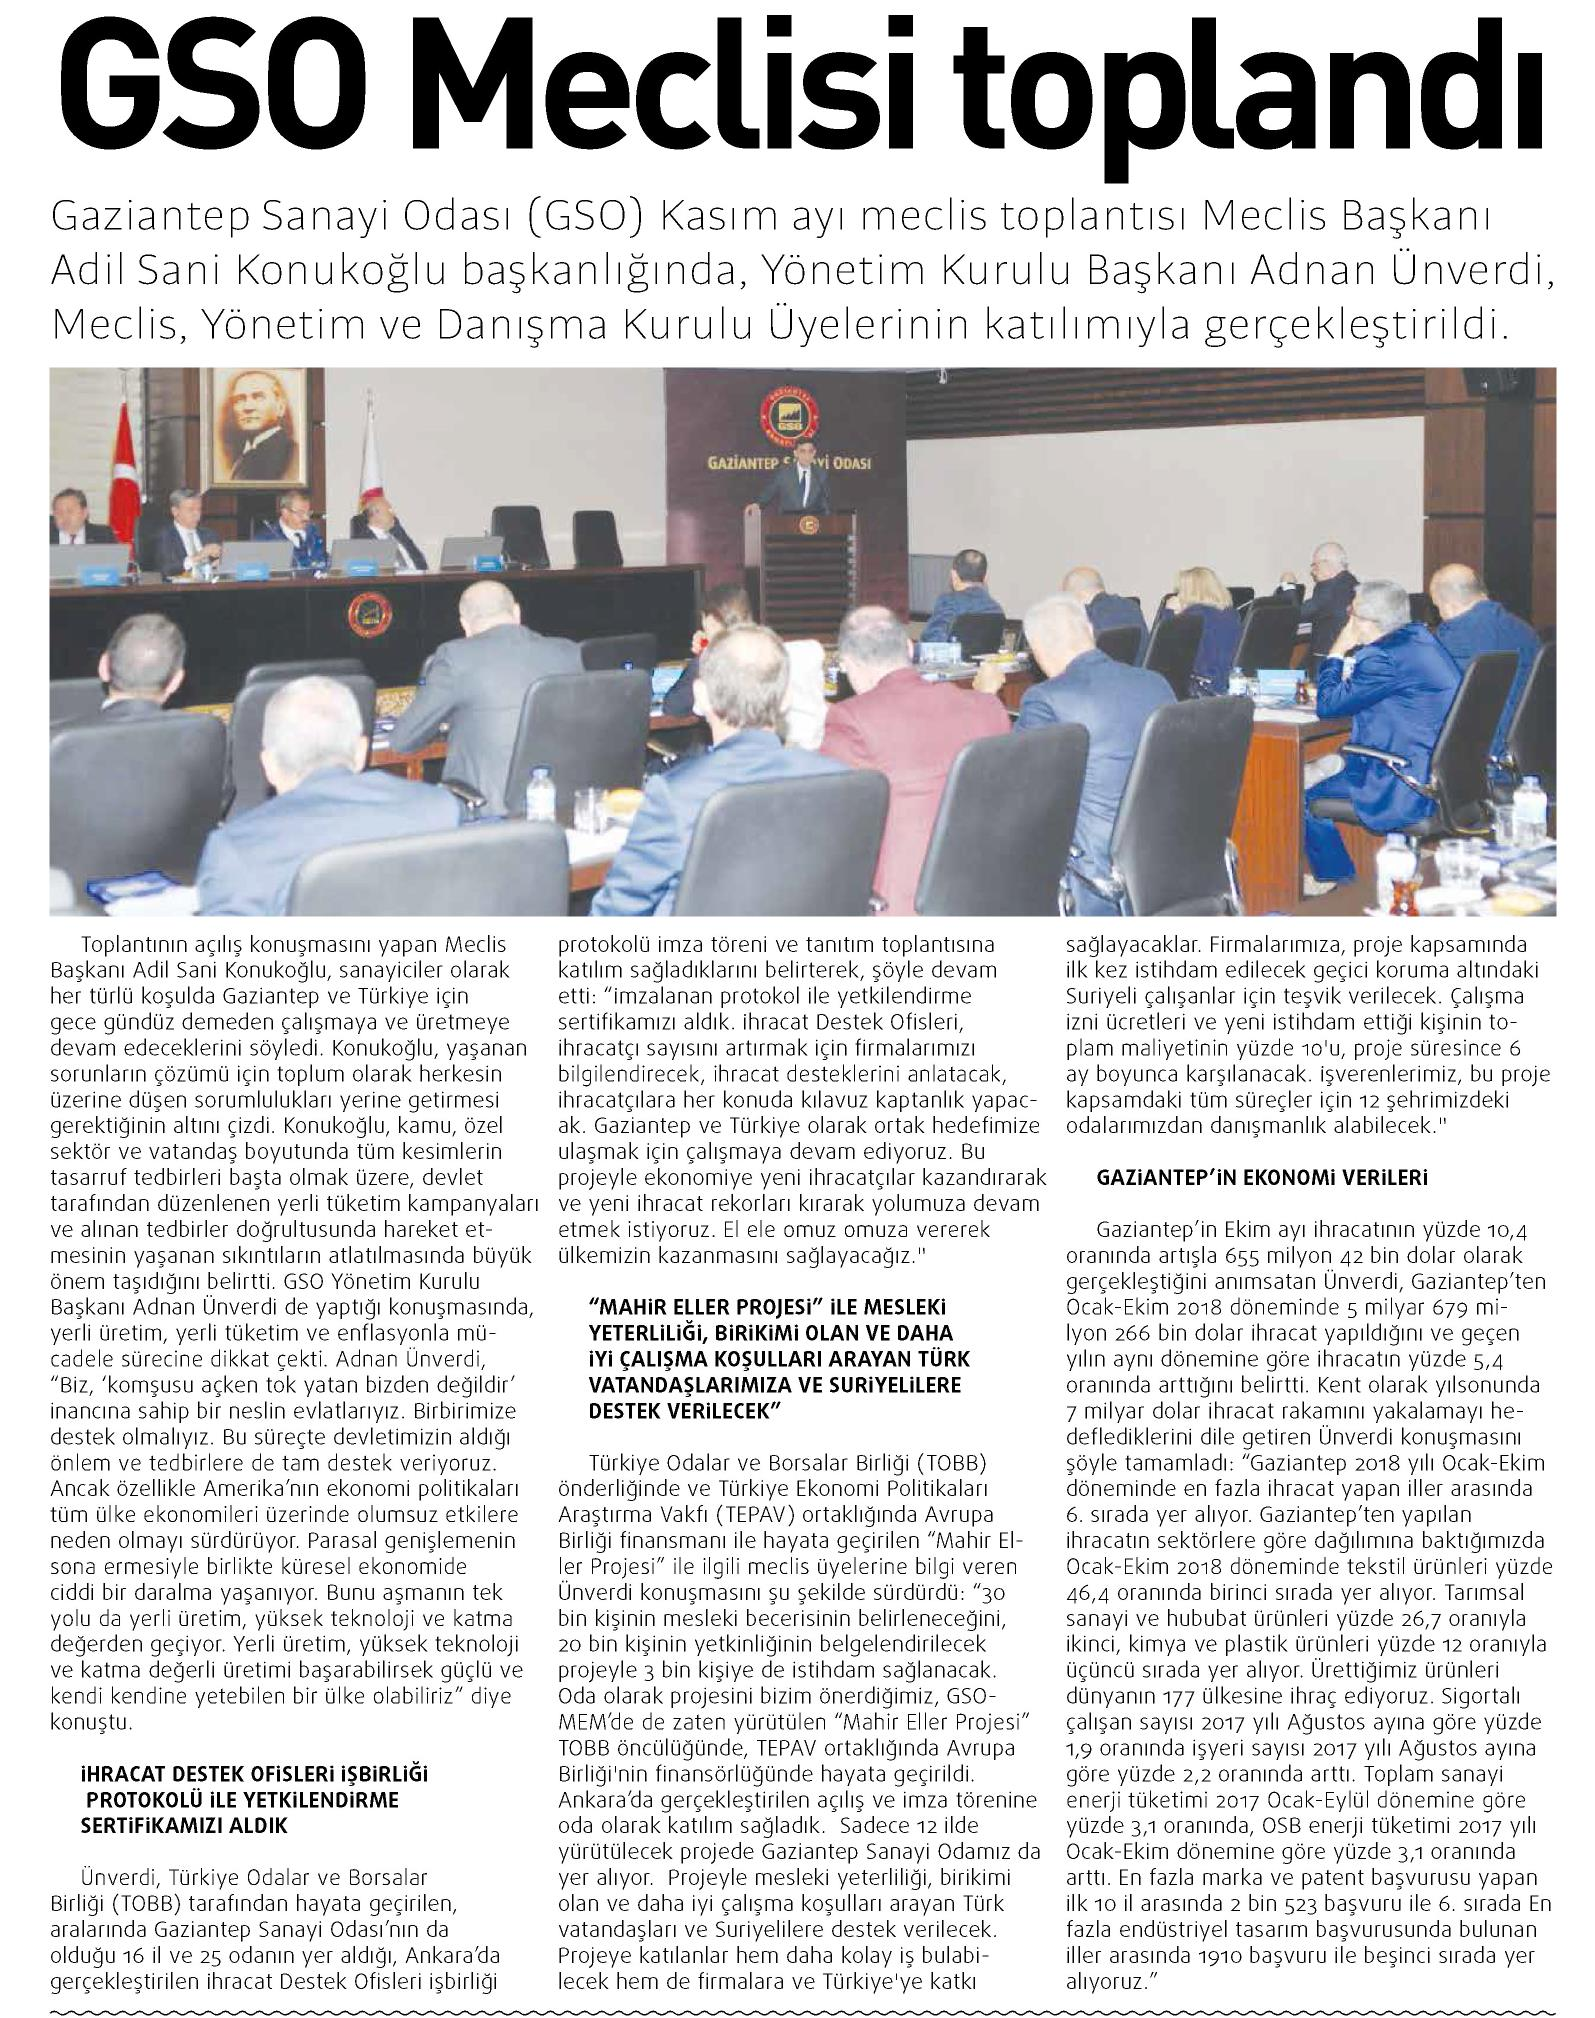 GSO Meclisi Toplantı Gaziantep GAP